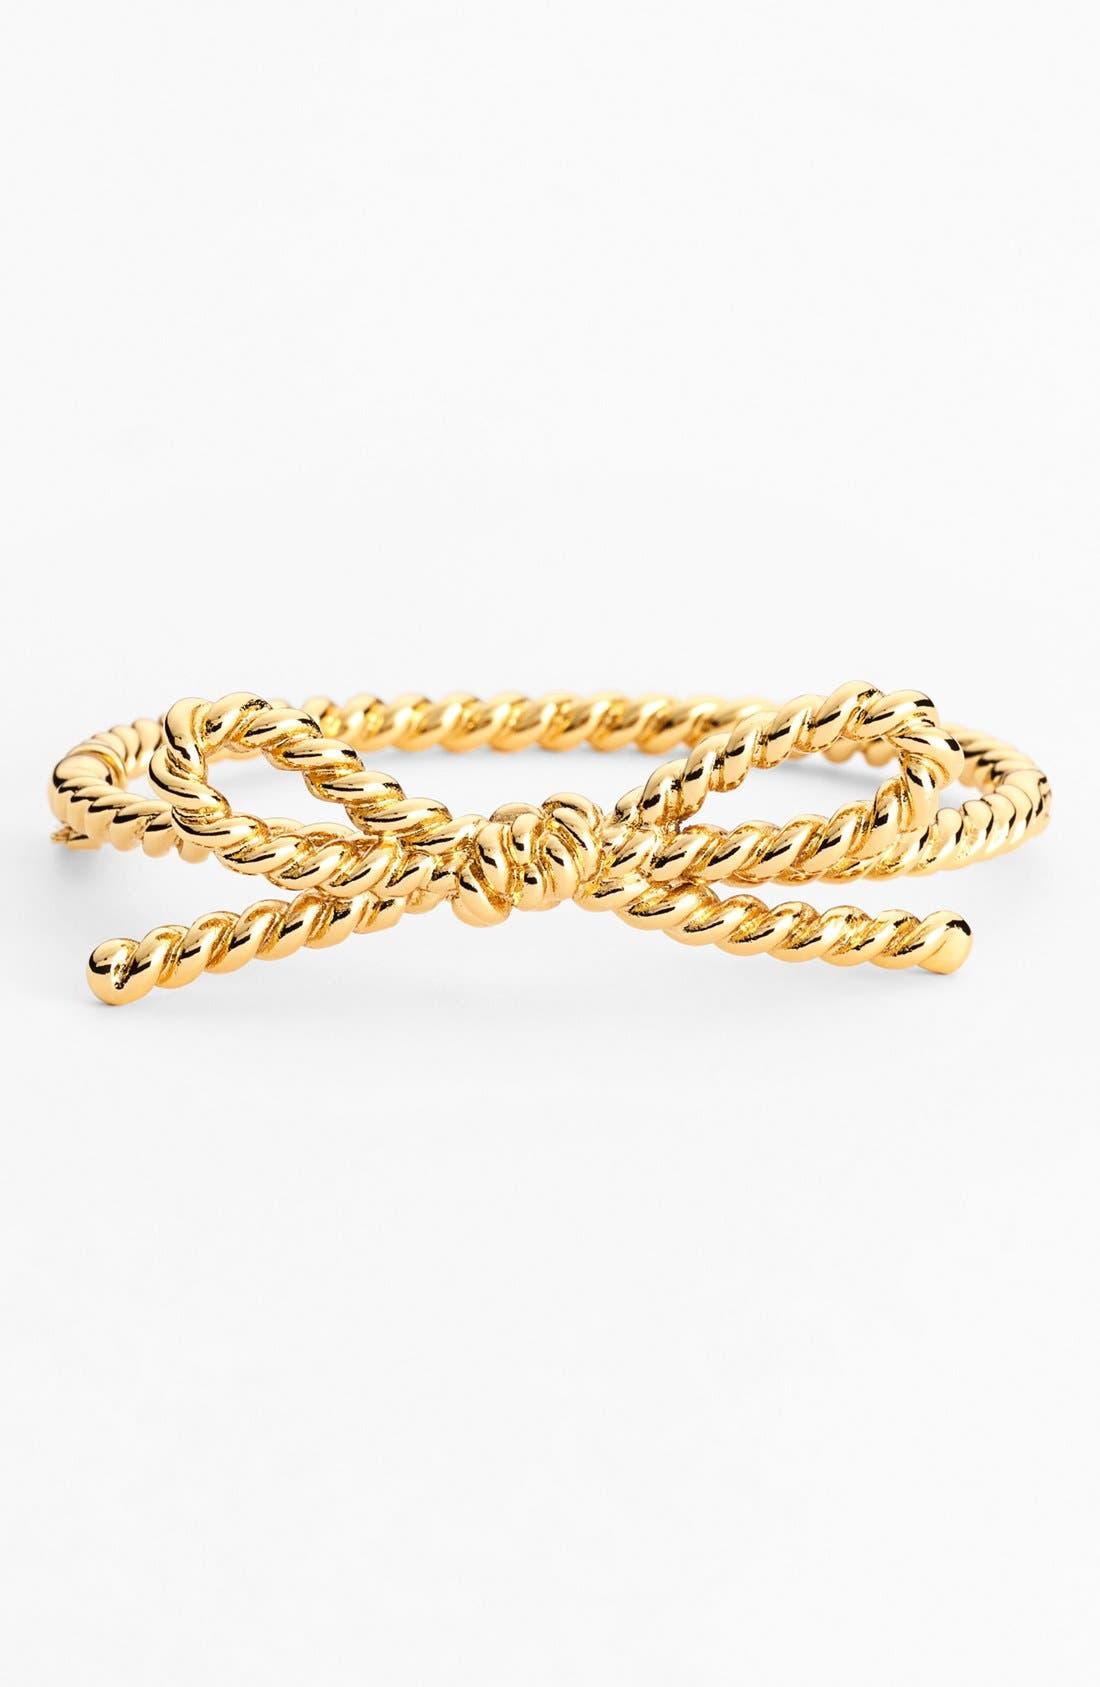 Alternate Image 1 Selected - kate spade new york 'skinny mini' rope bow bangle bracelet